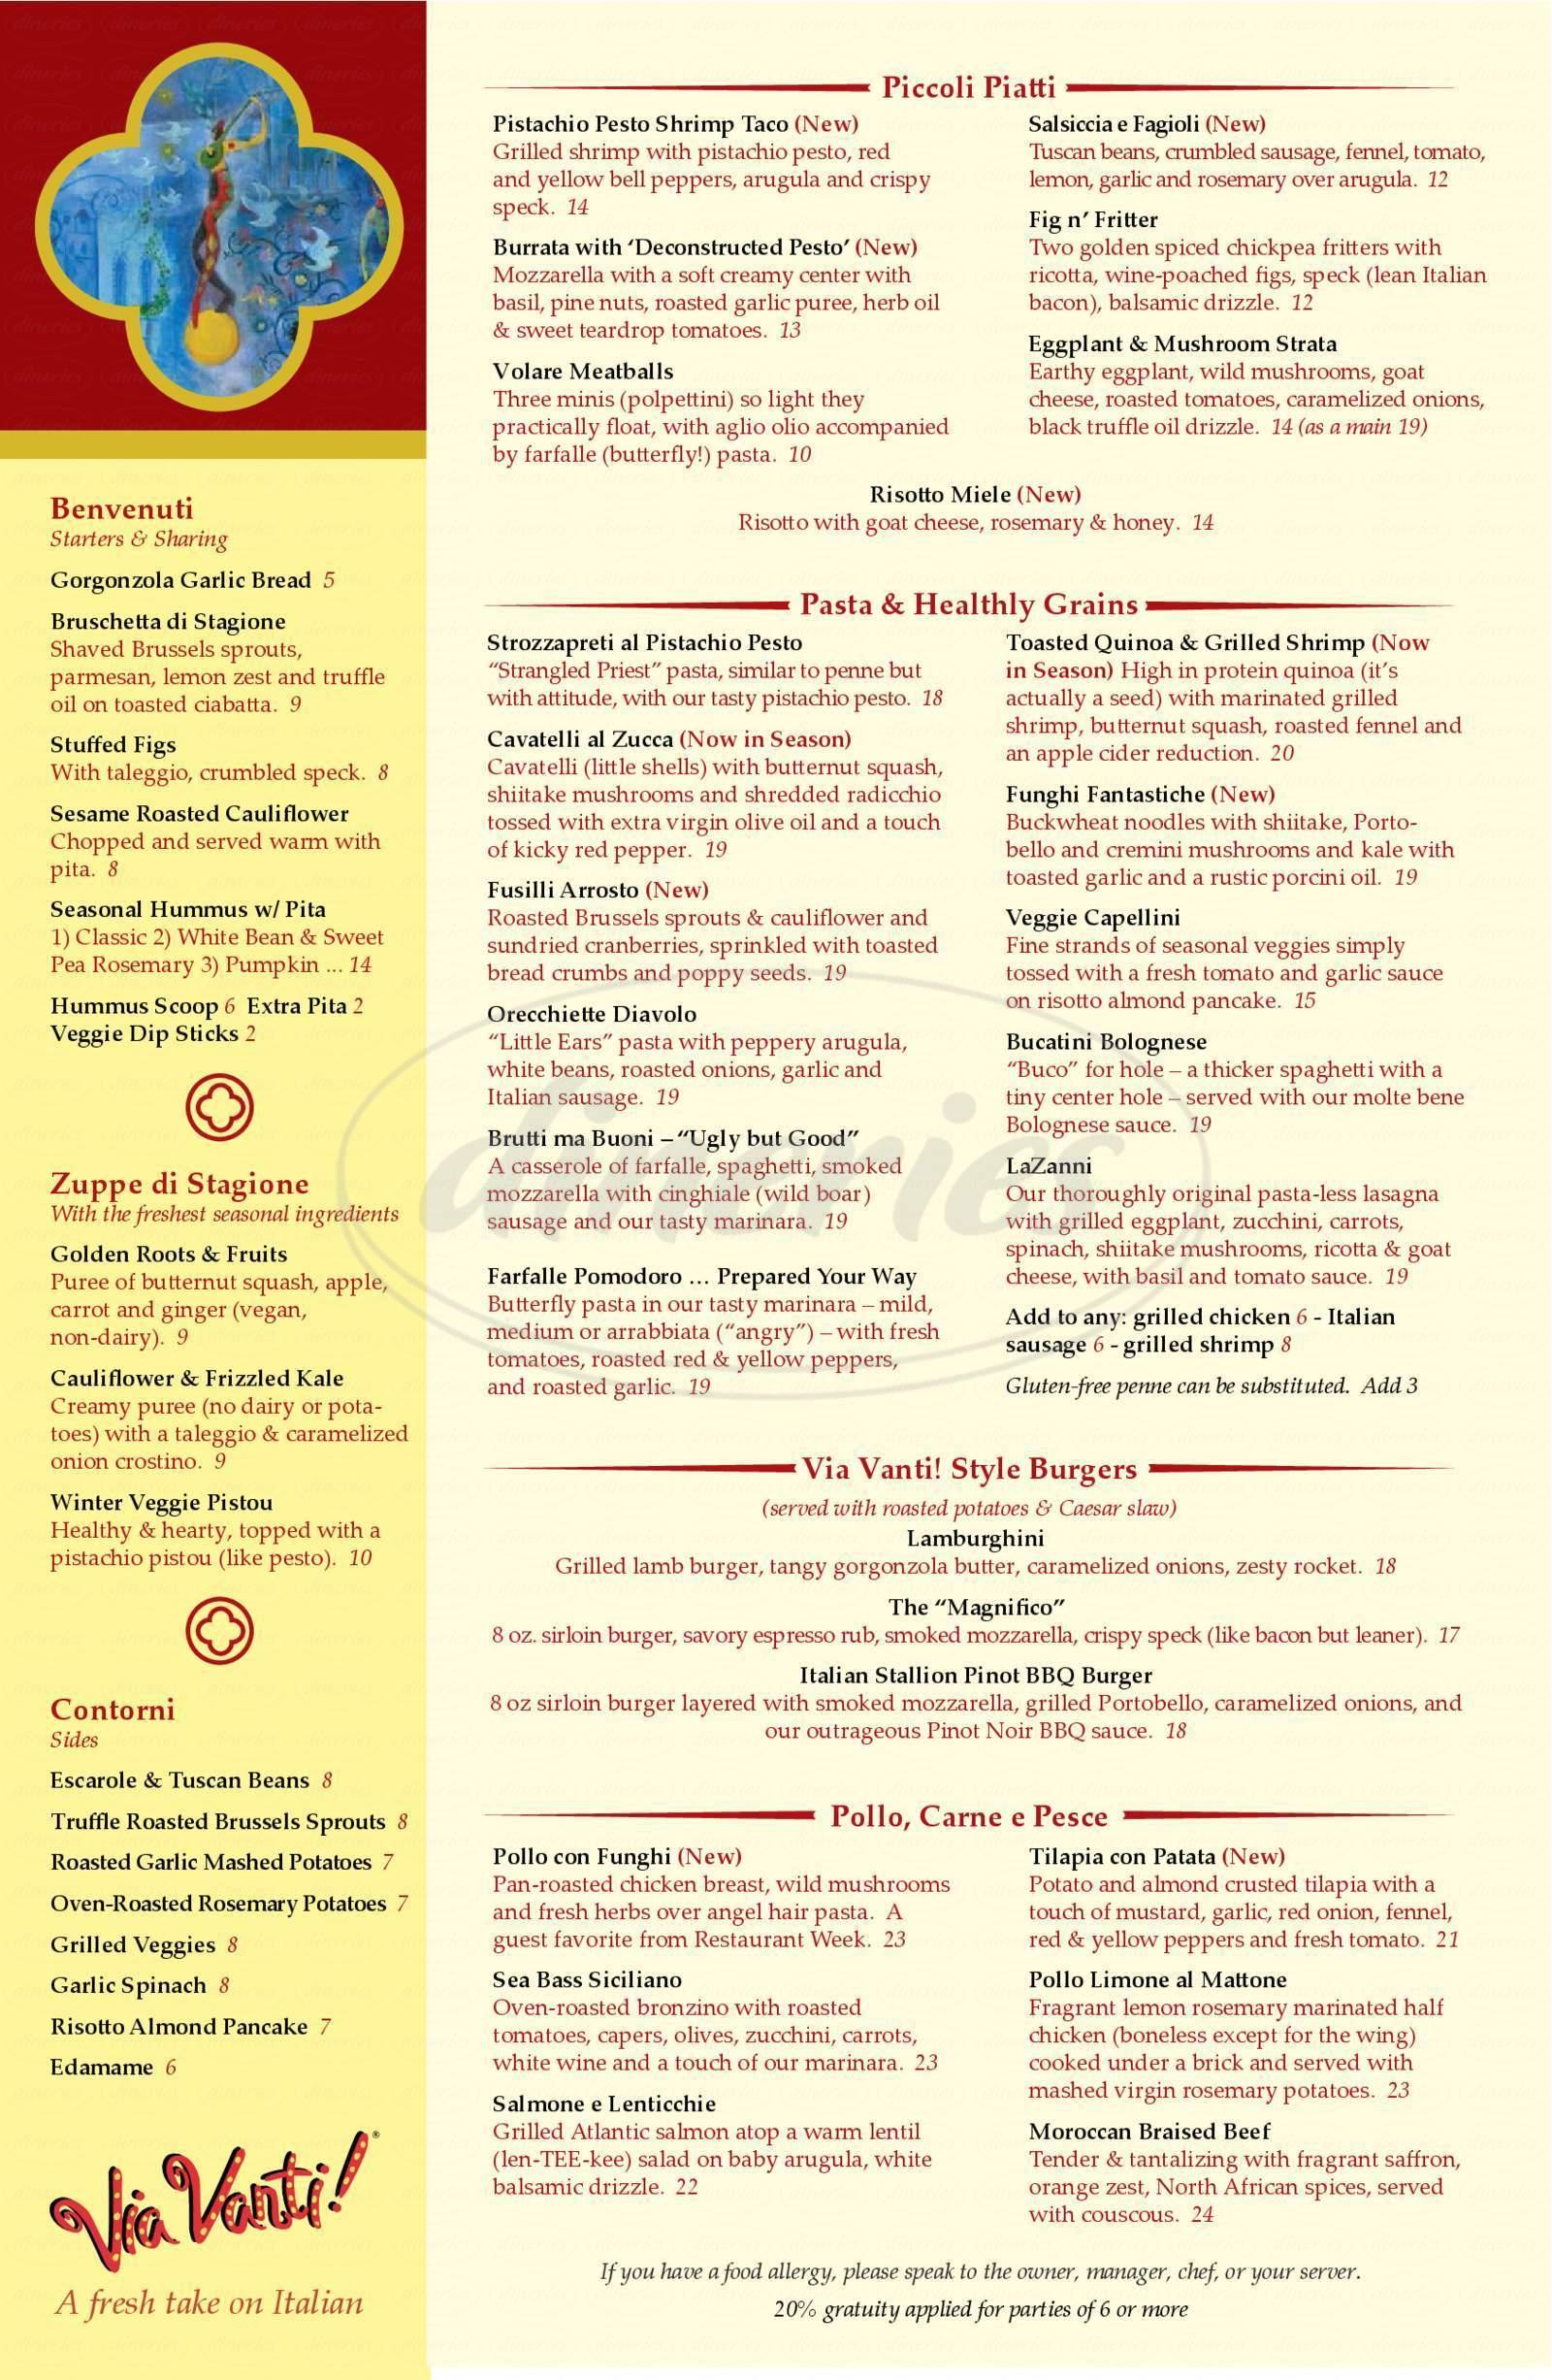 menu for Via Vanti!